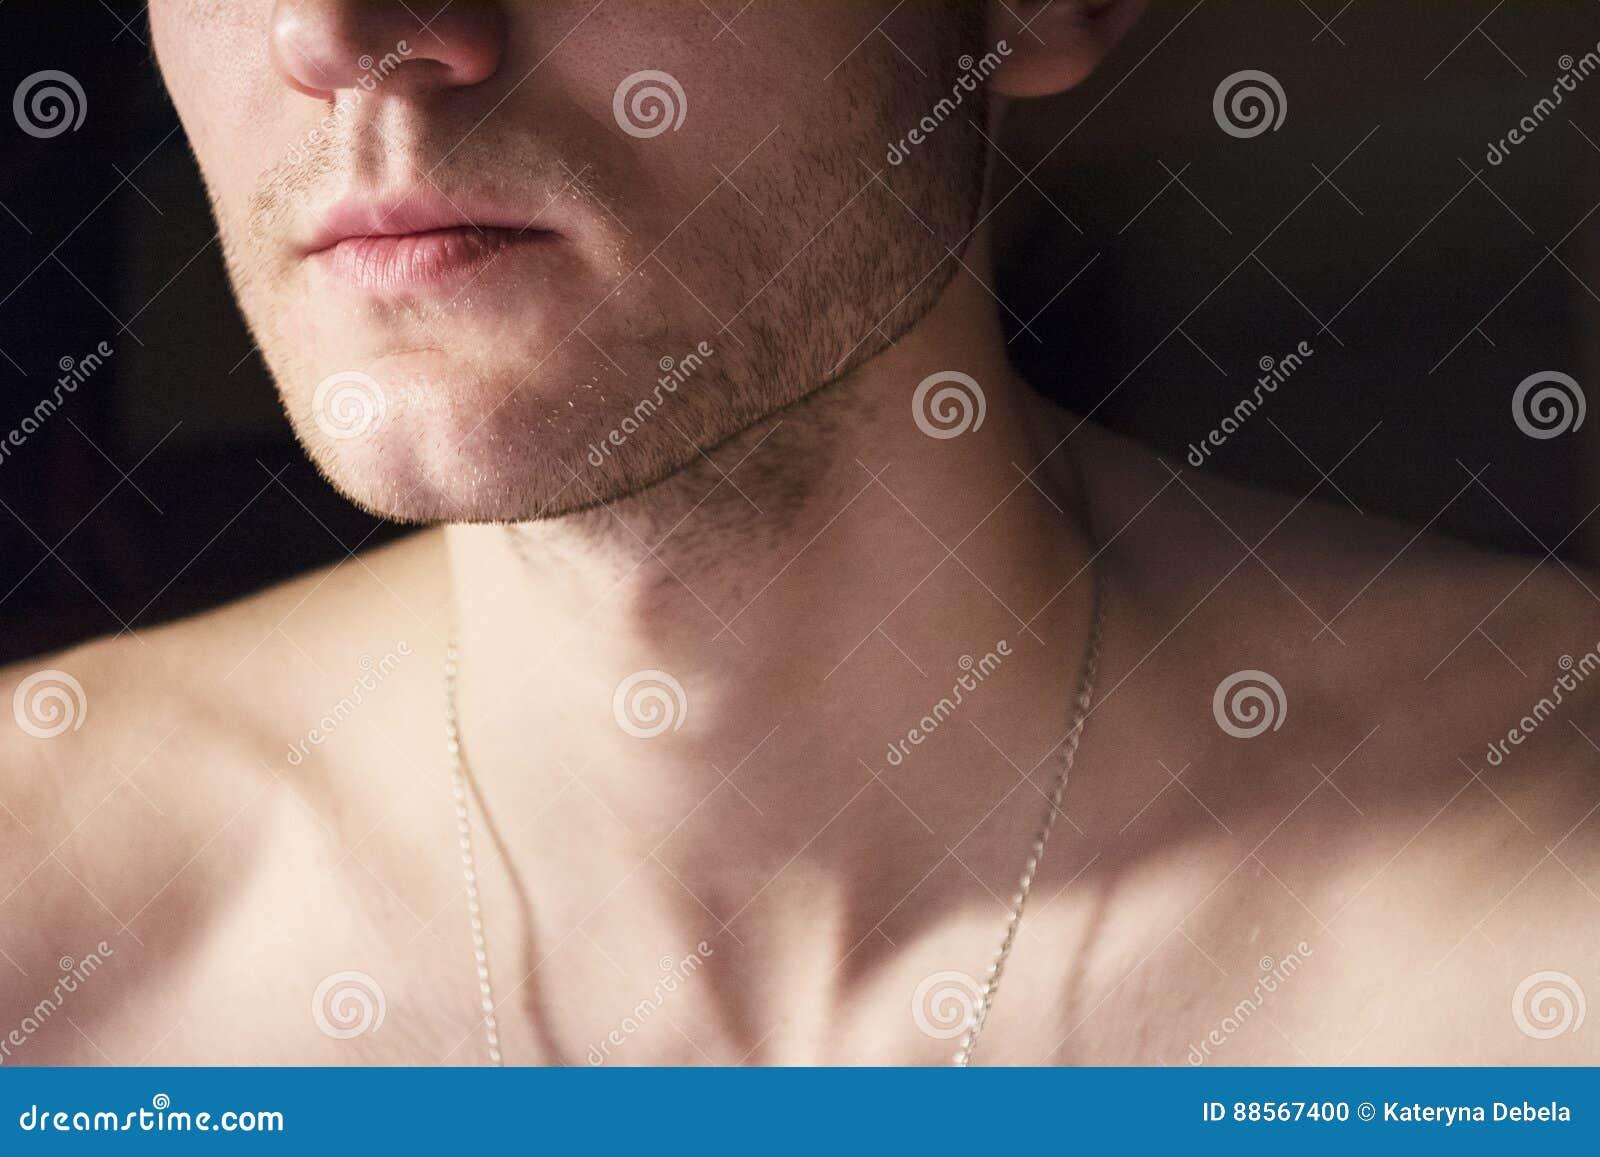 Brooke shields photographique nude